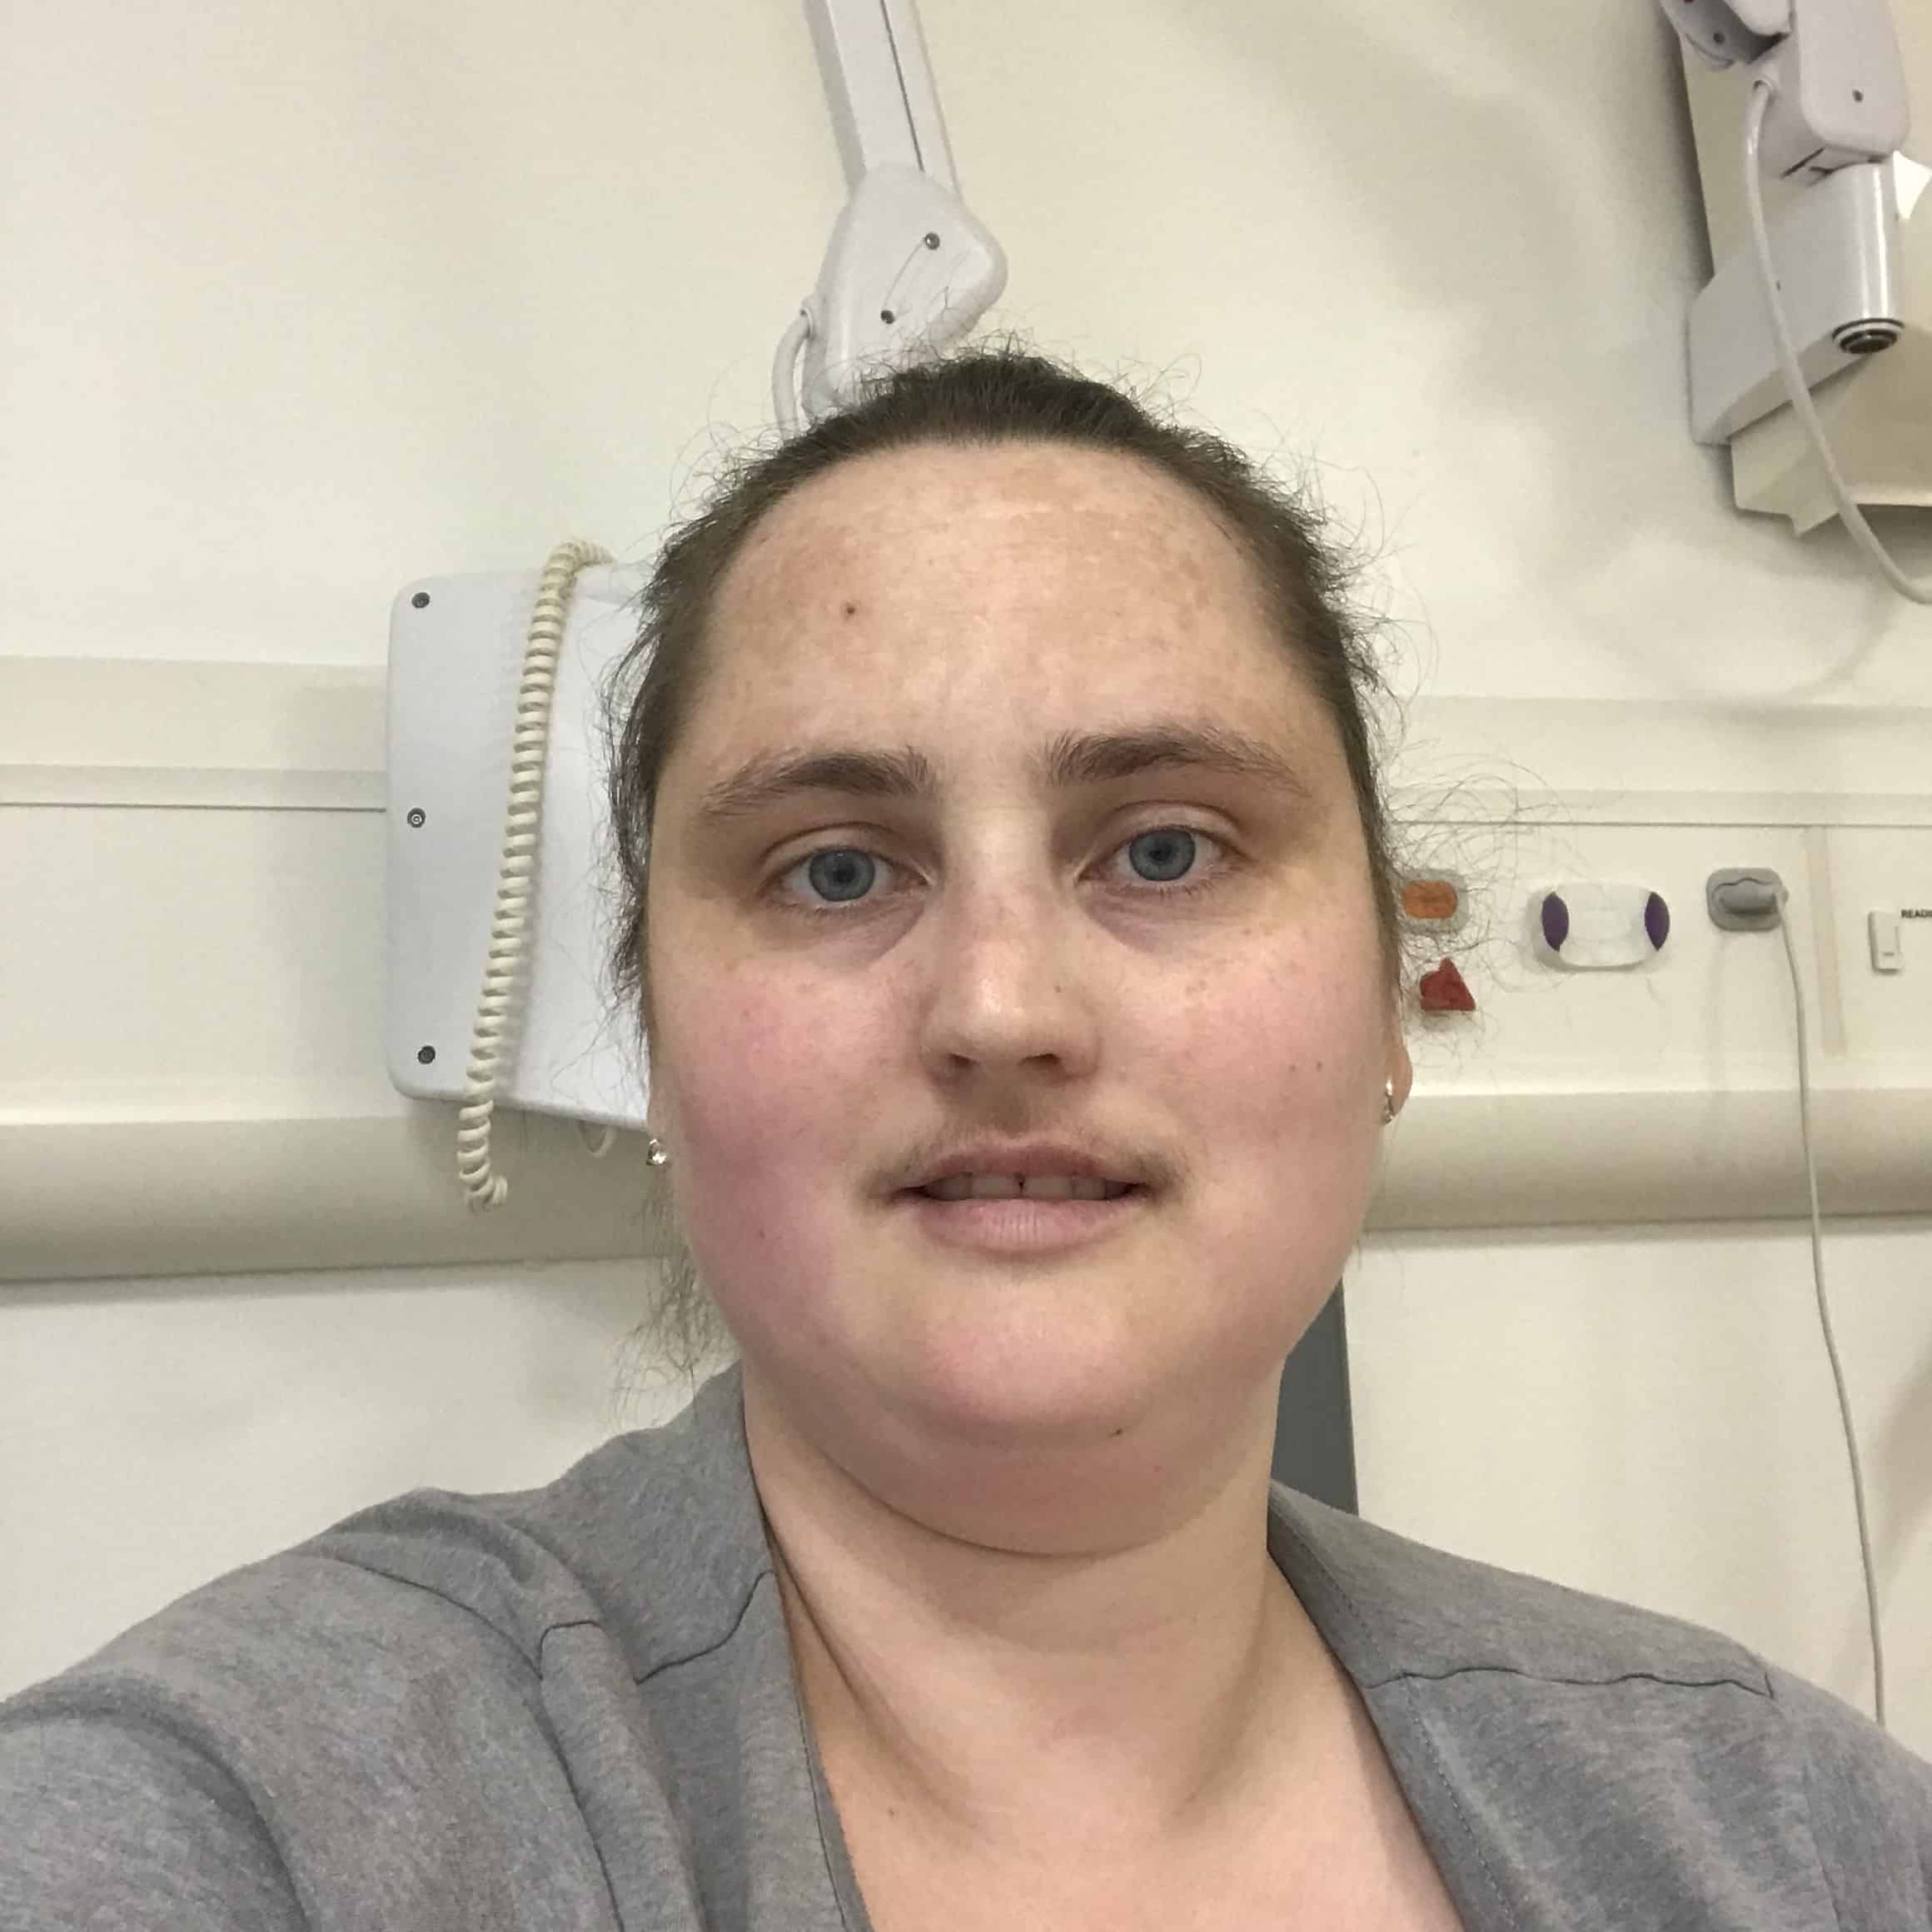 stuck in hospital